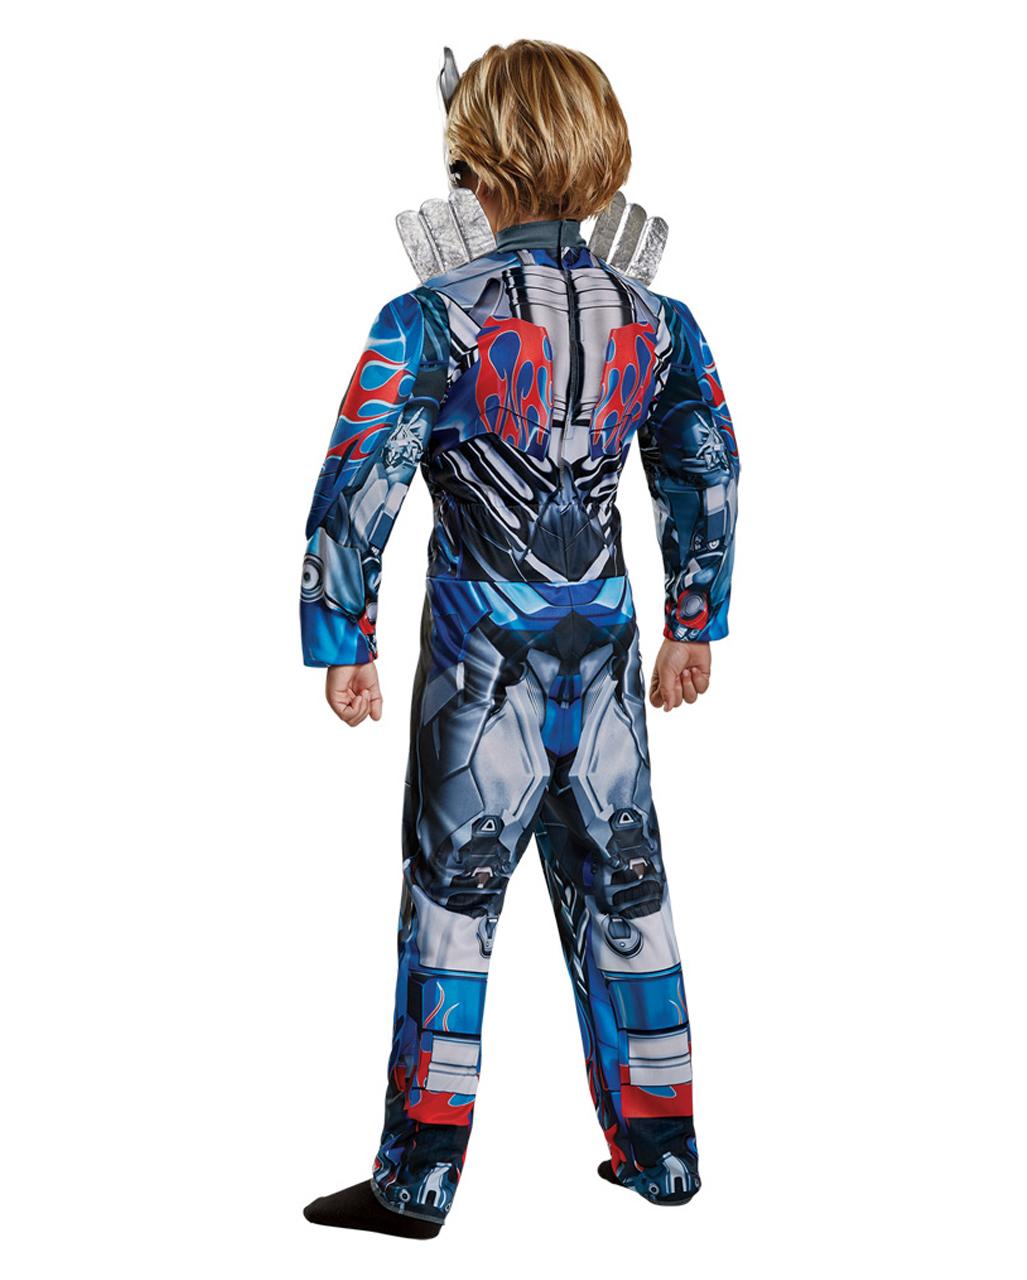 Optimus Prime Transformers Robot Fancy Dress Up Halloween Toddler Child Costume